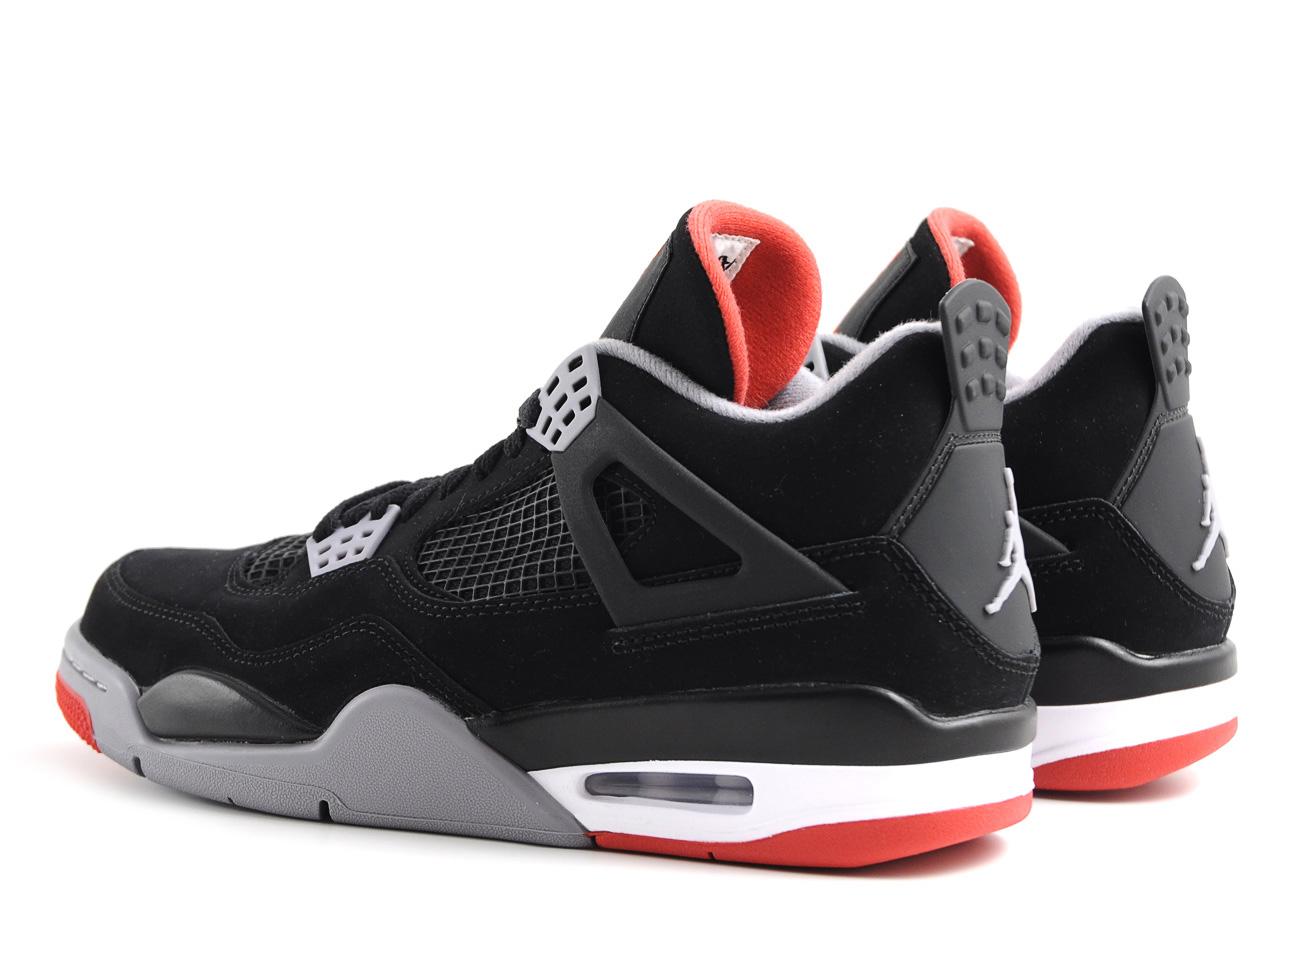 Nike Air Jordan 4 Retro Black / Cement Grey / Fire Red | Novoid Plus